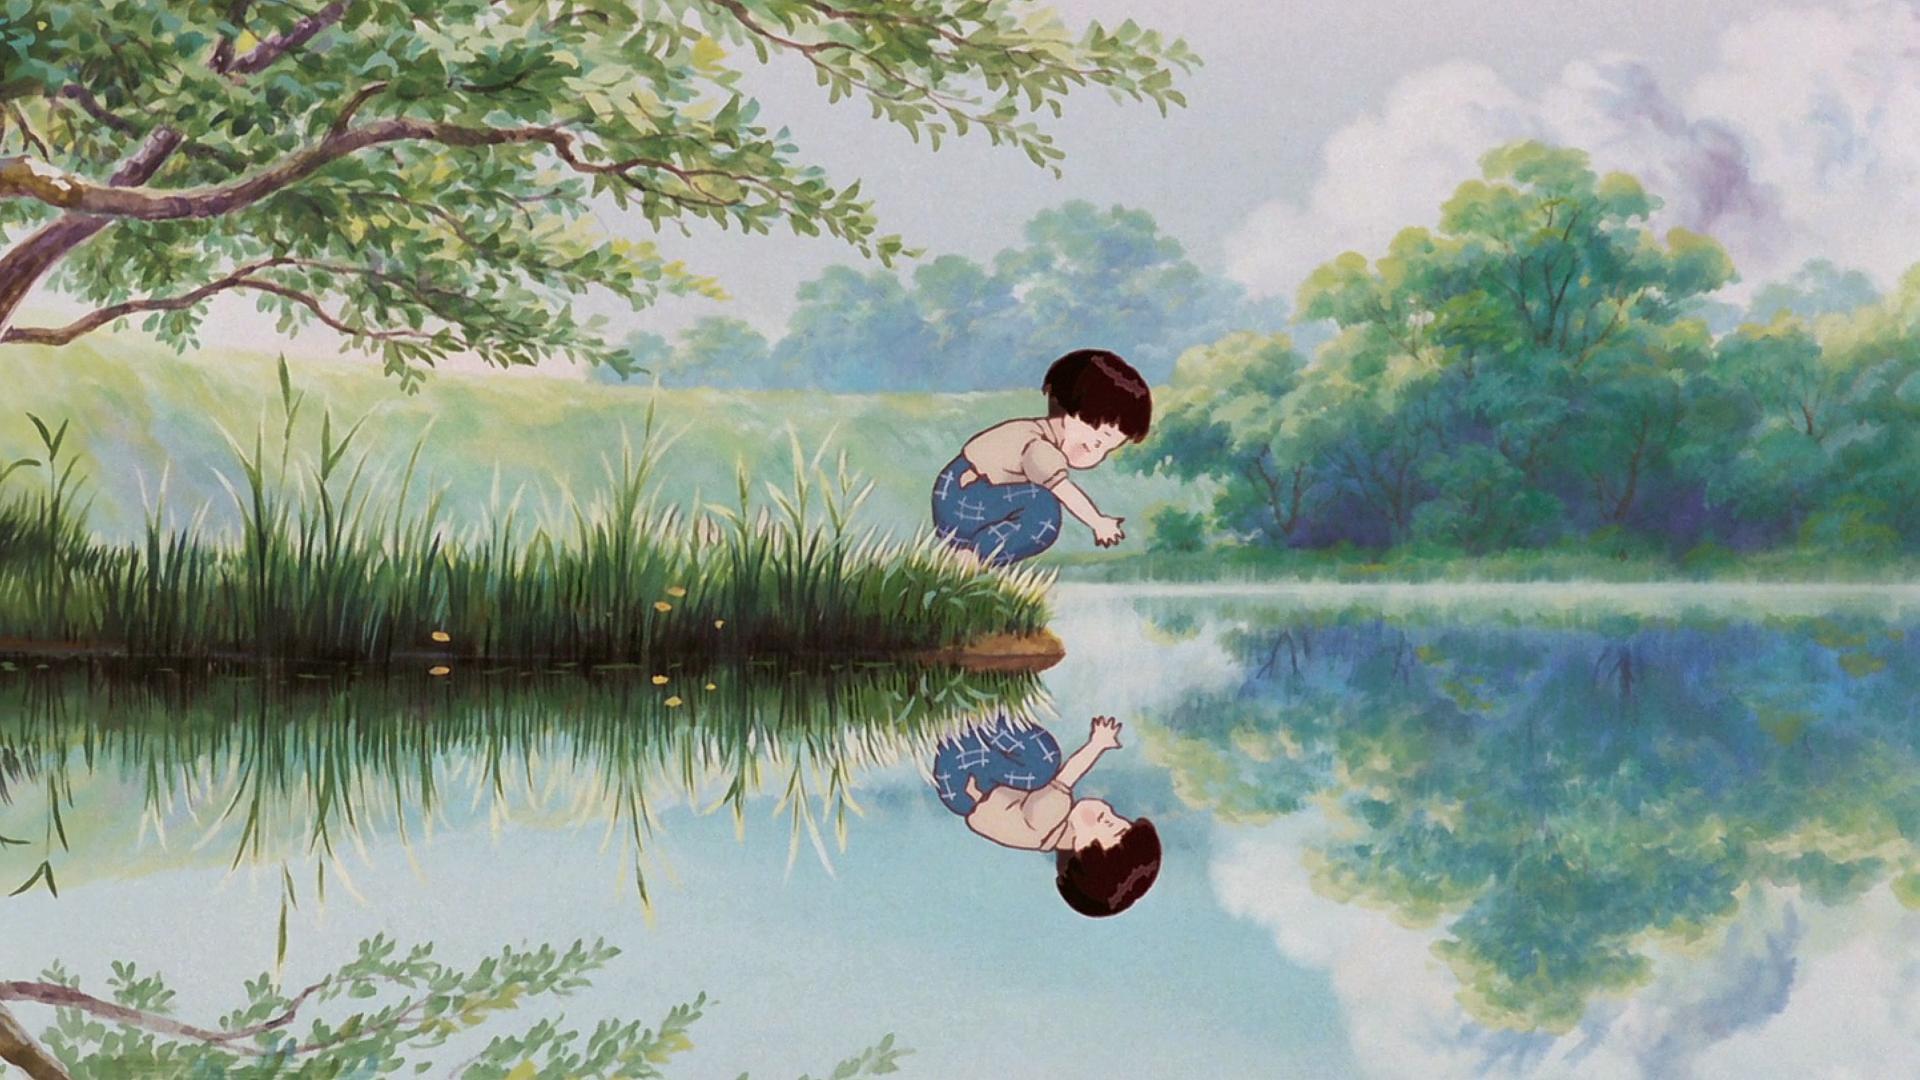 studio Ghibli papier peint  wallpaper download at HD